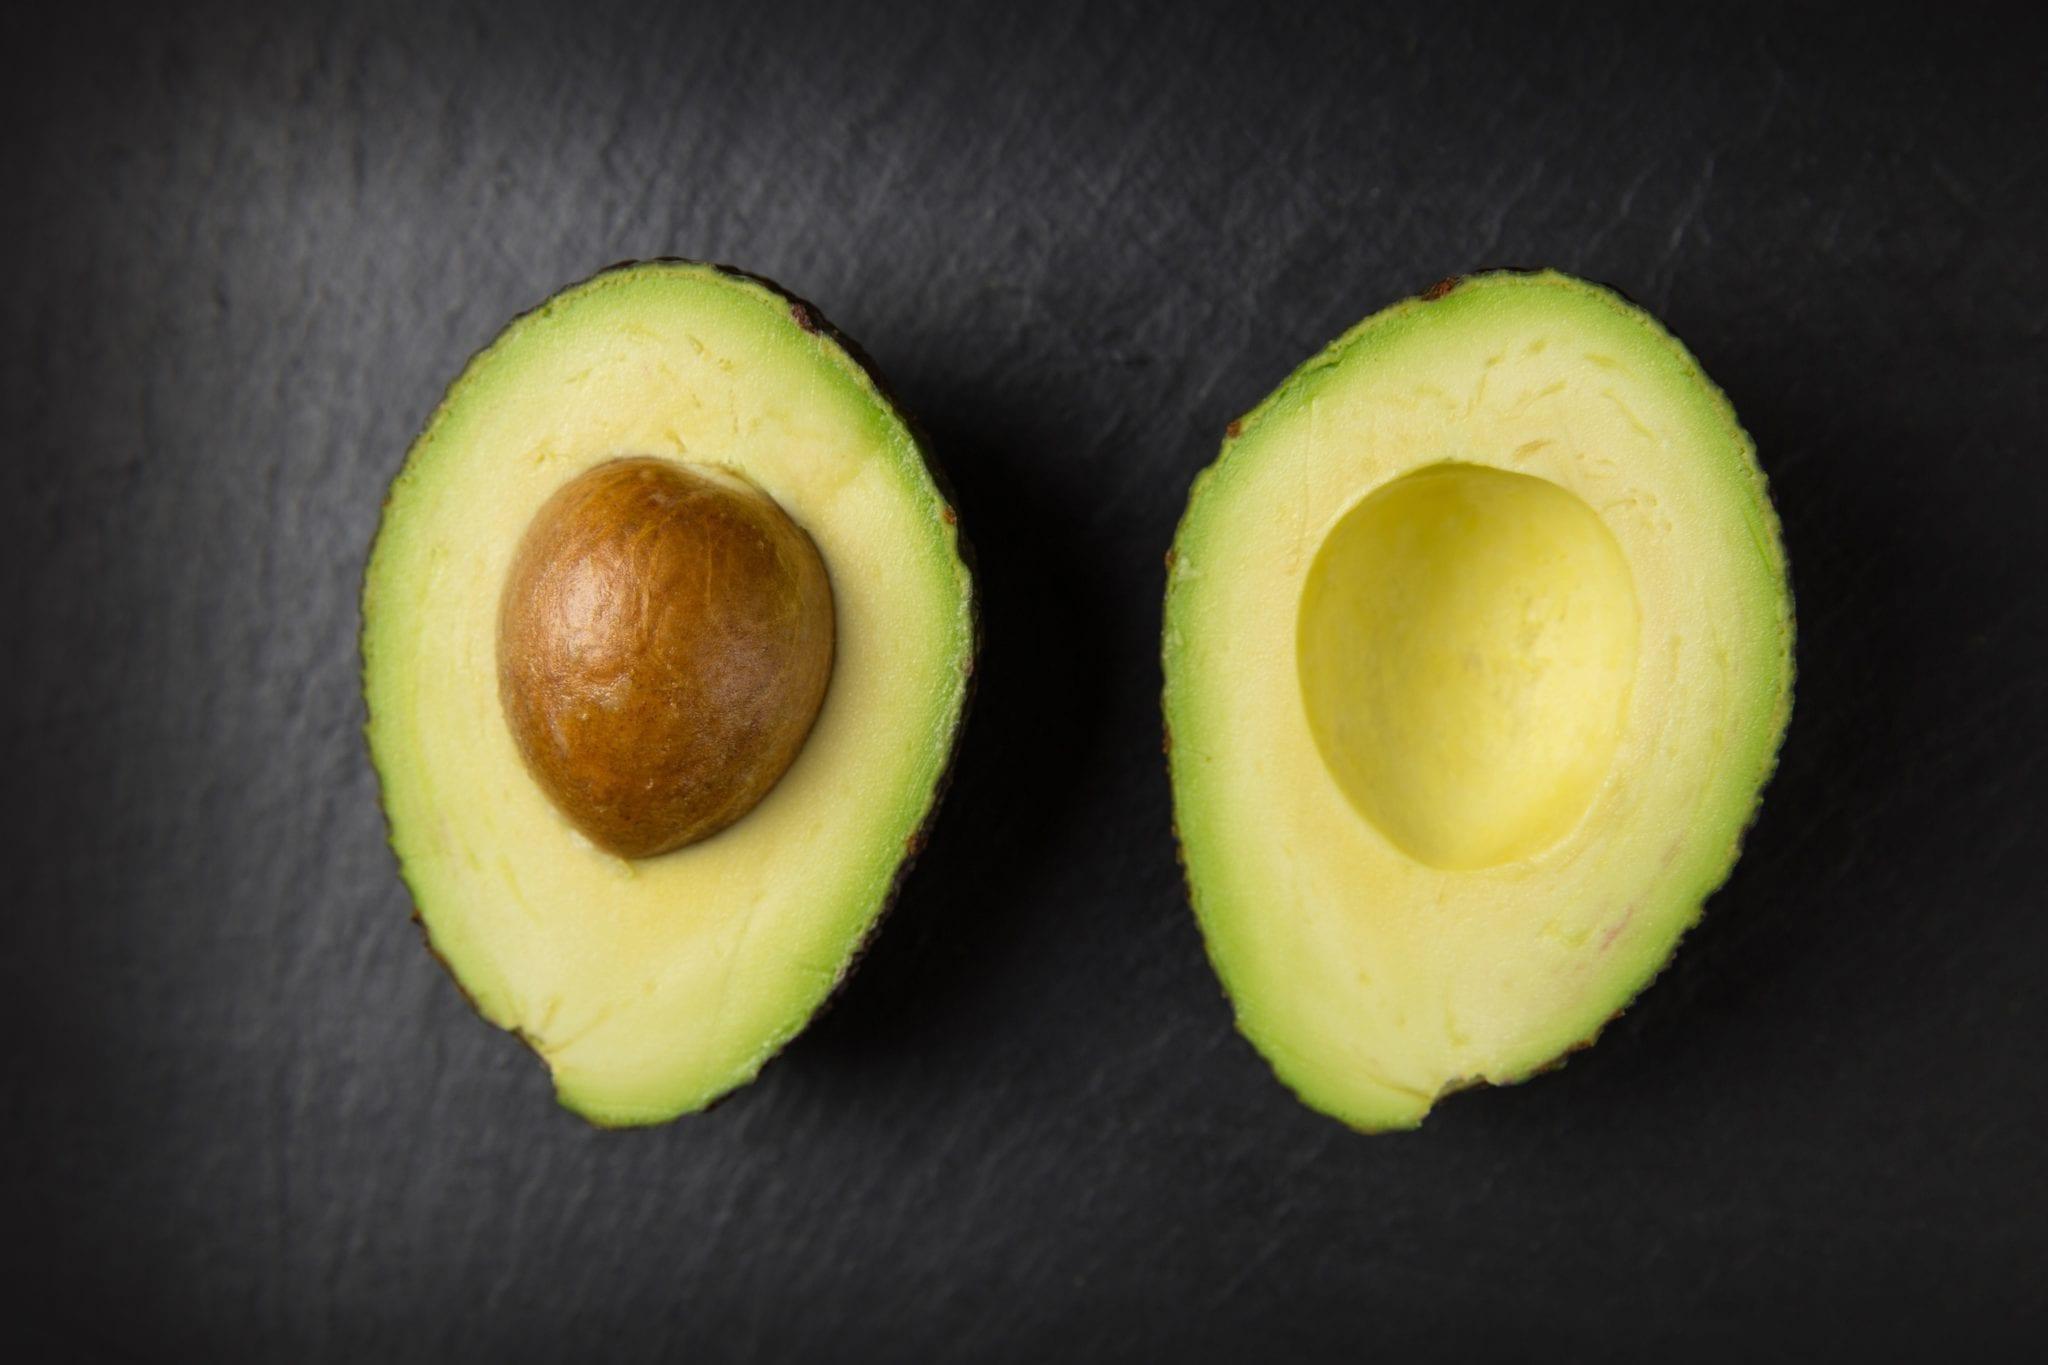 Skin Food Saturday - Creamy Avocado Truffles